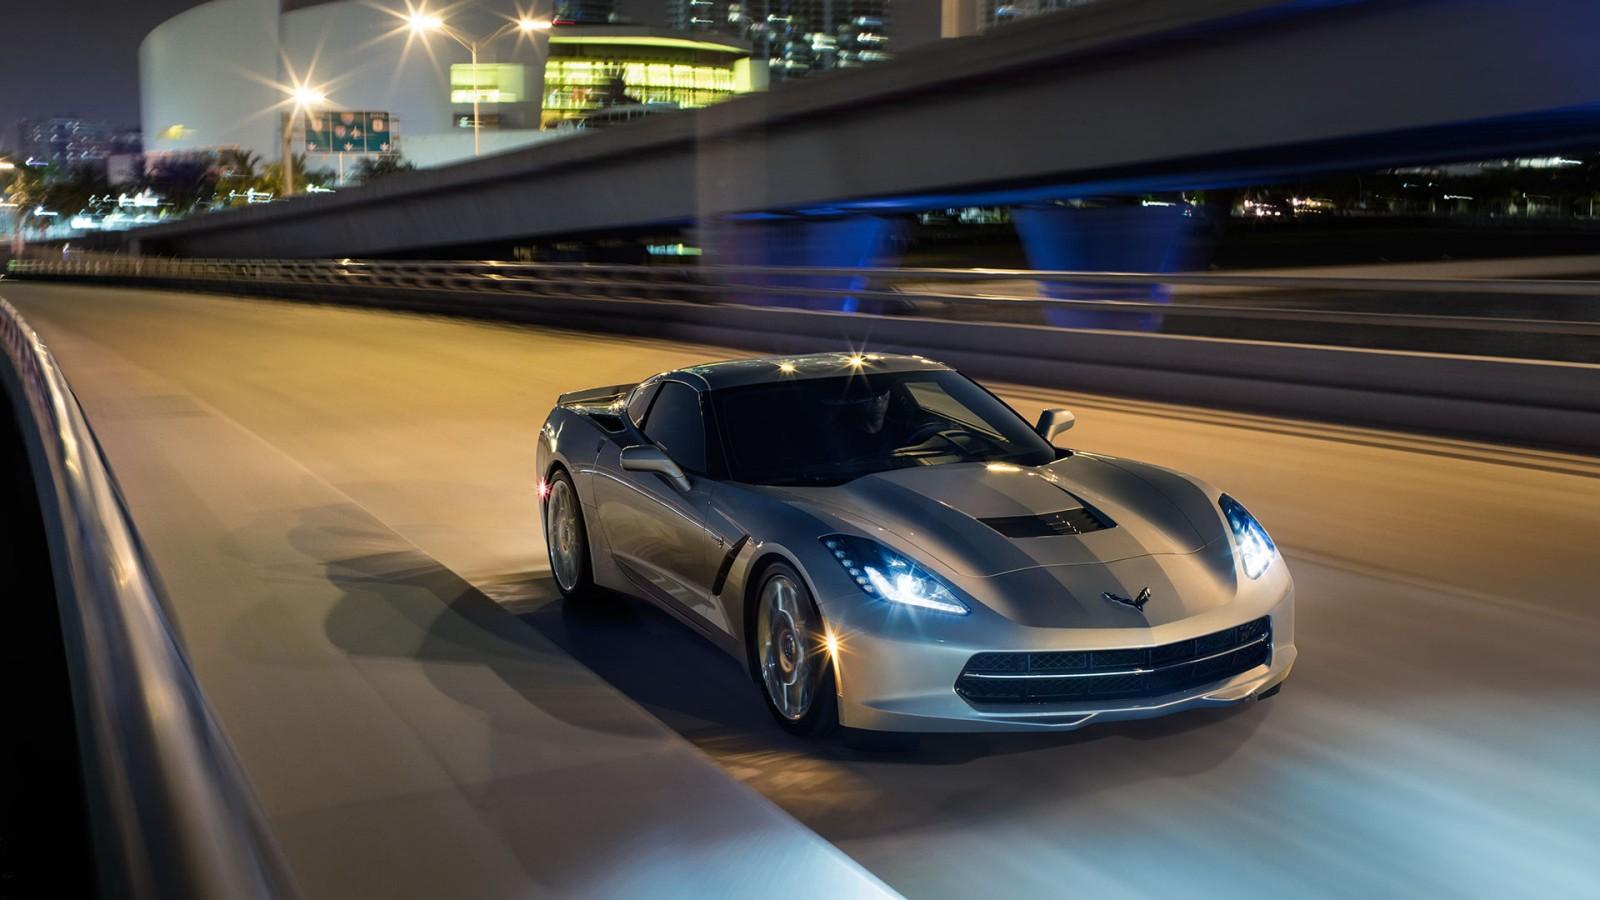 2016 Chevy Corvette Stingray Tops Retained Value Awards List